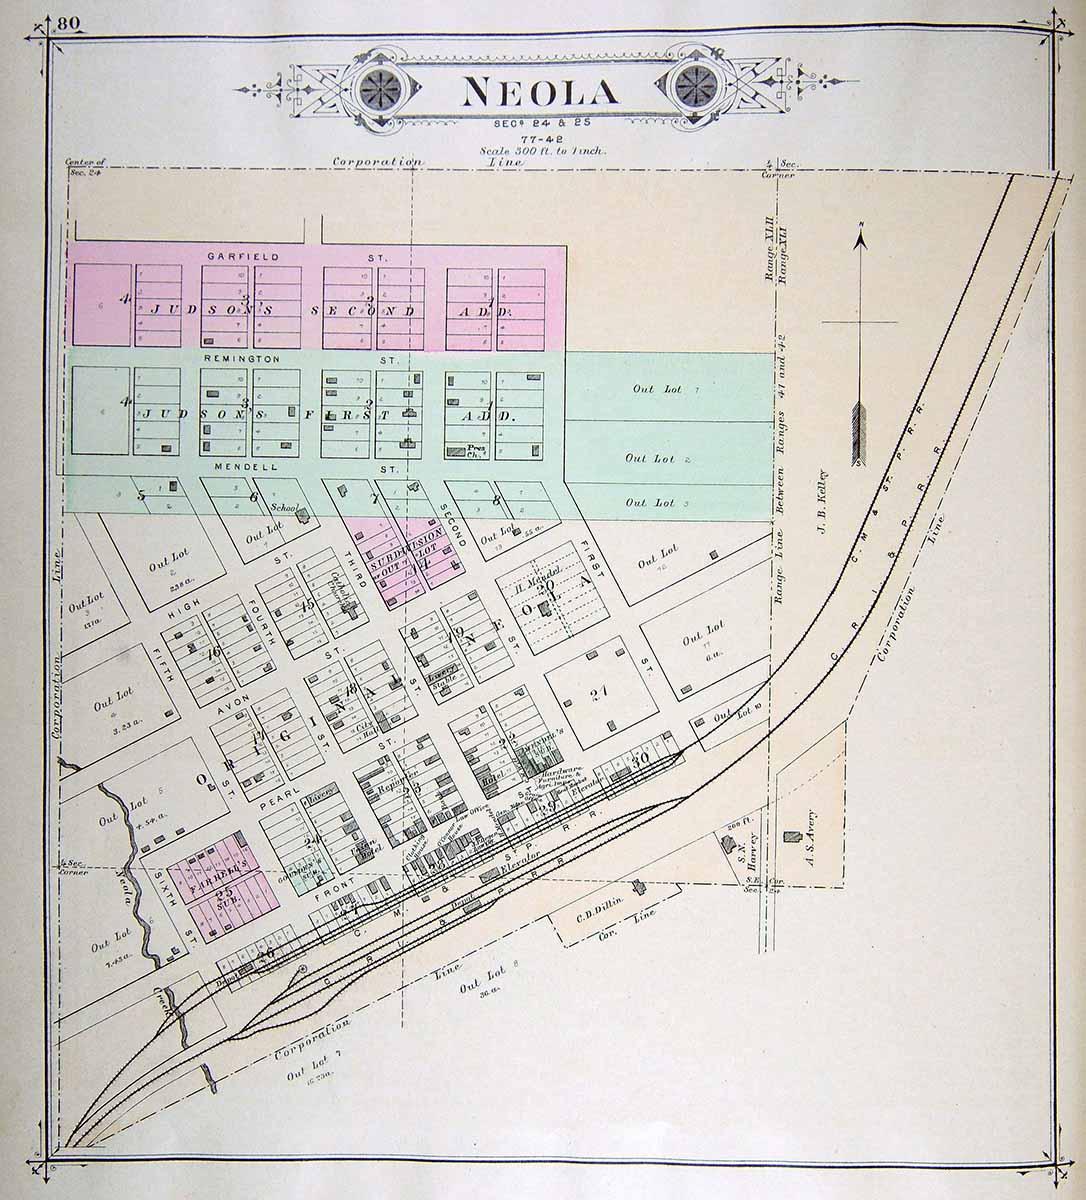 Iagenweb Pott Co City Maps 1885